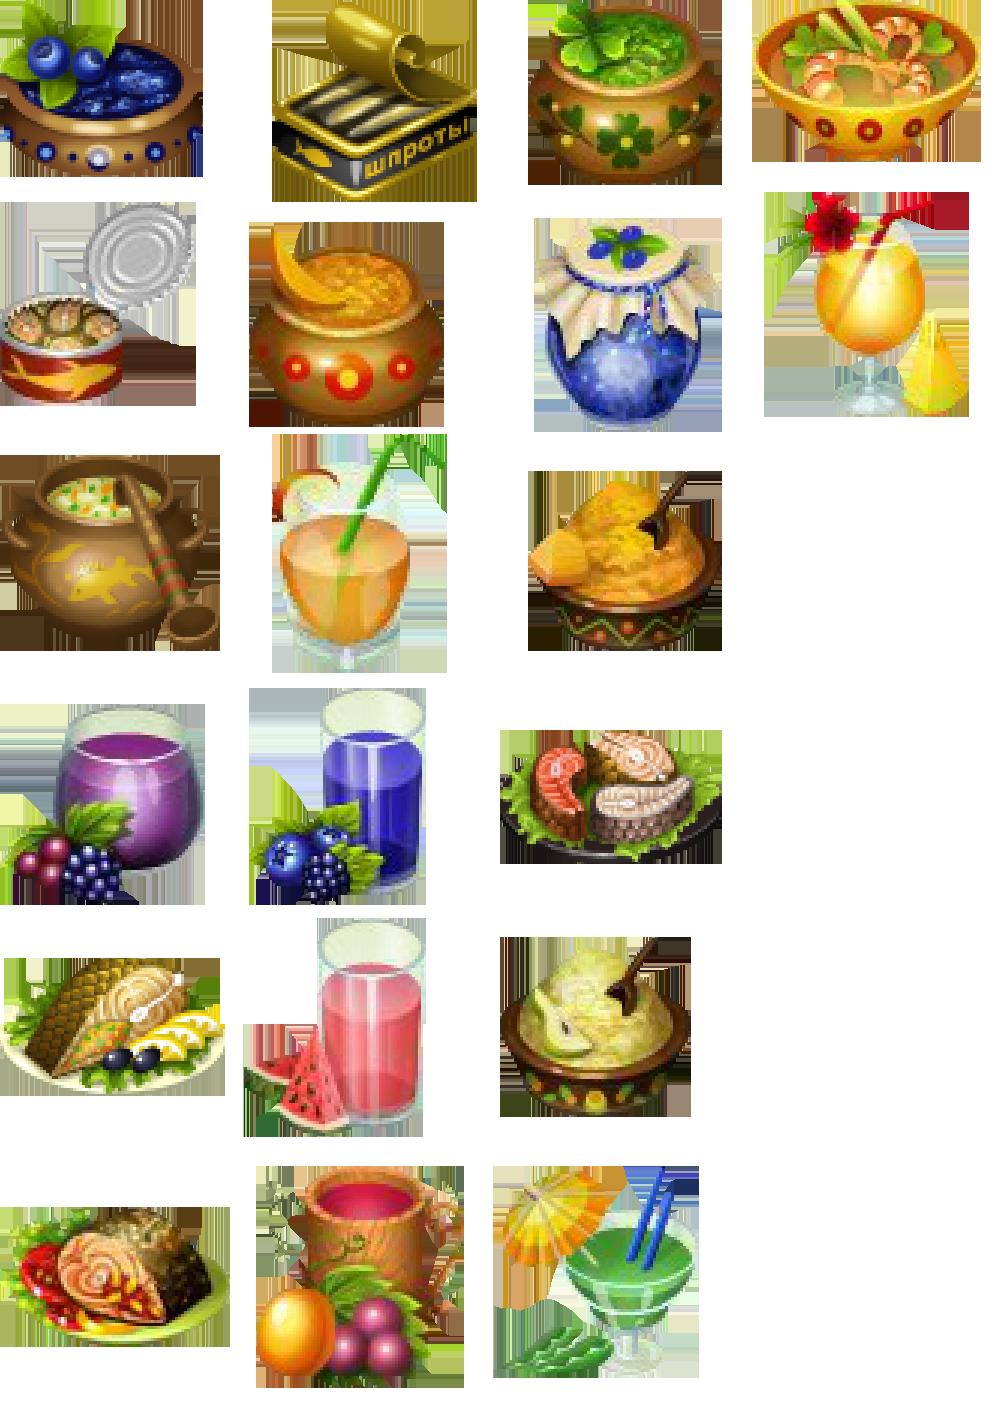 лукьяненко картинки еды из аватарии вполне